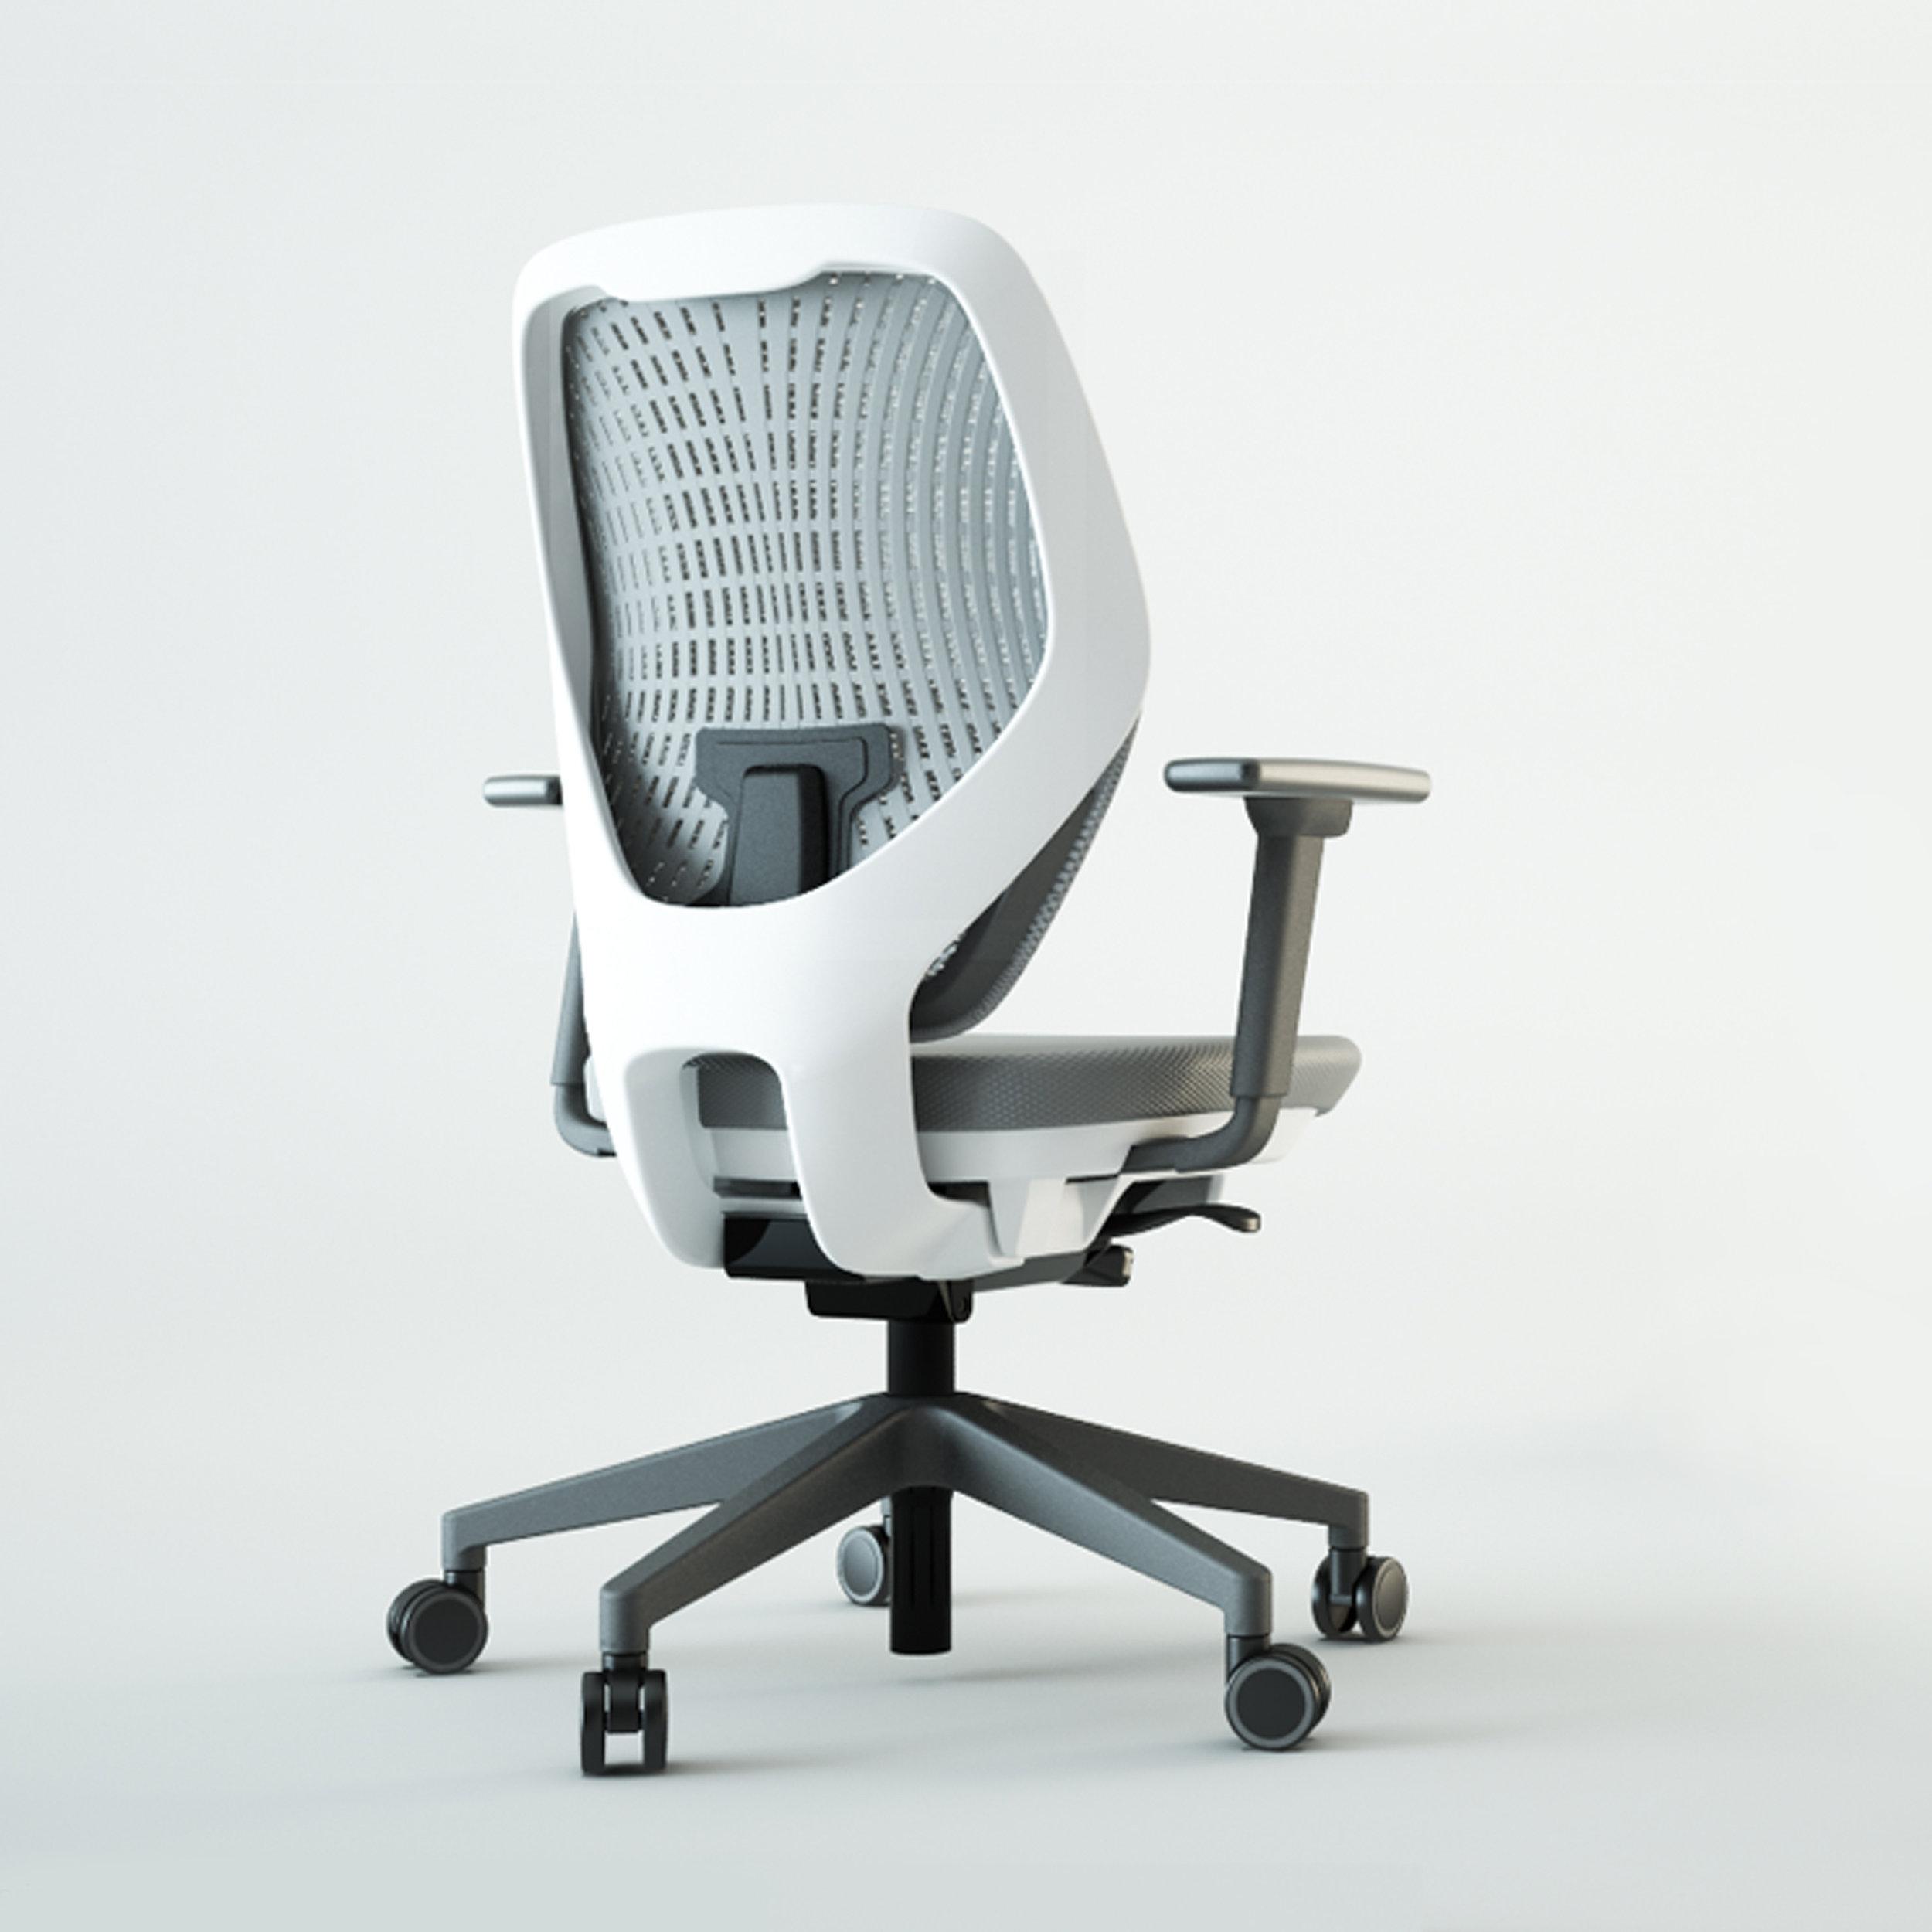 MUMA Ingo Chair